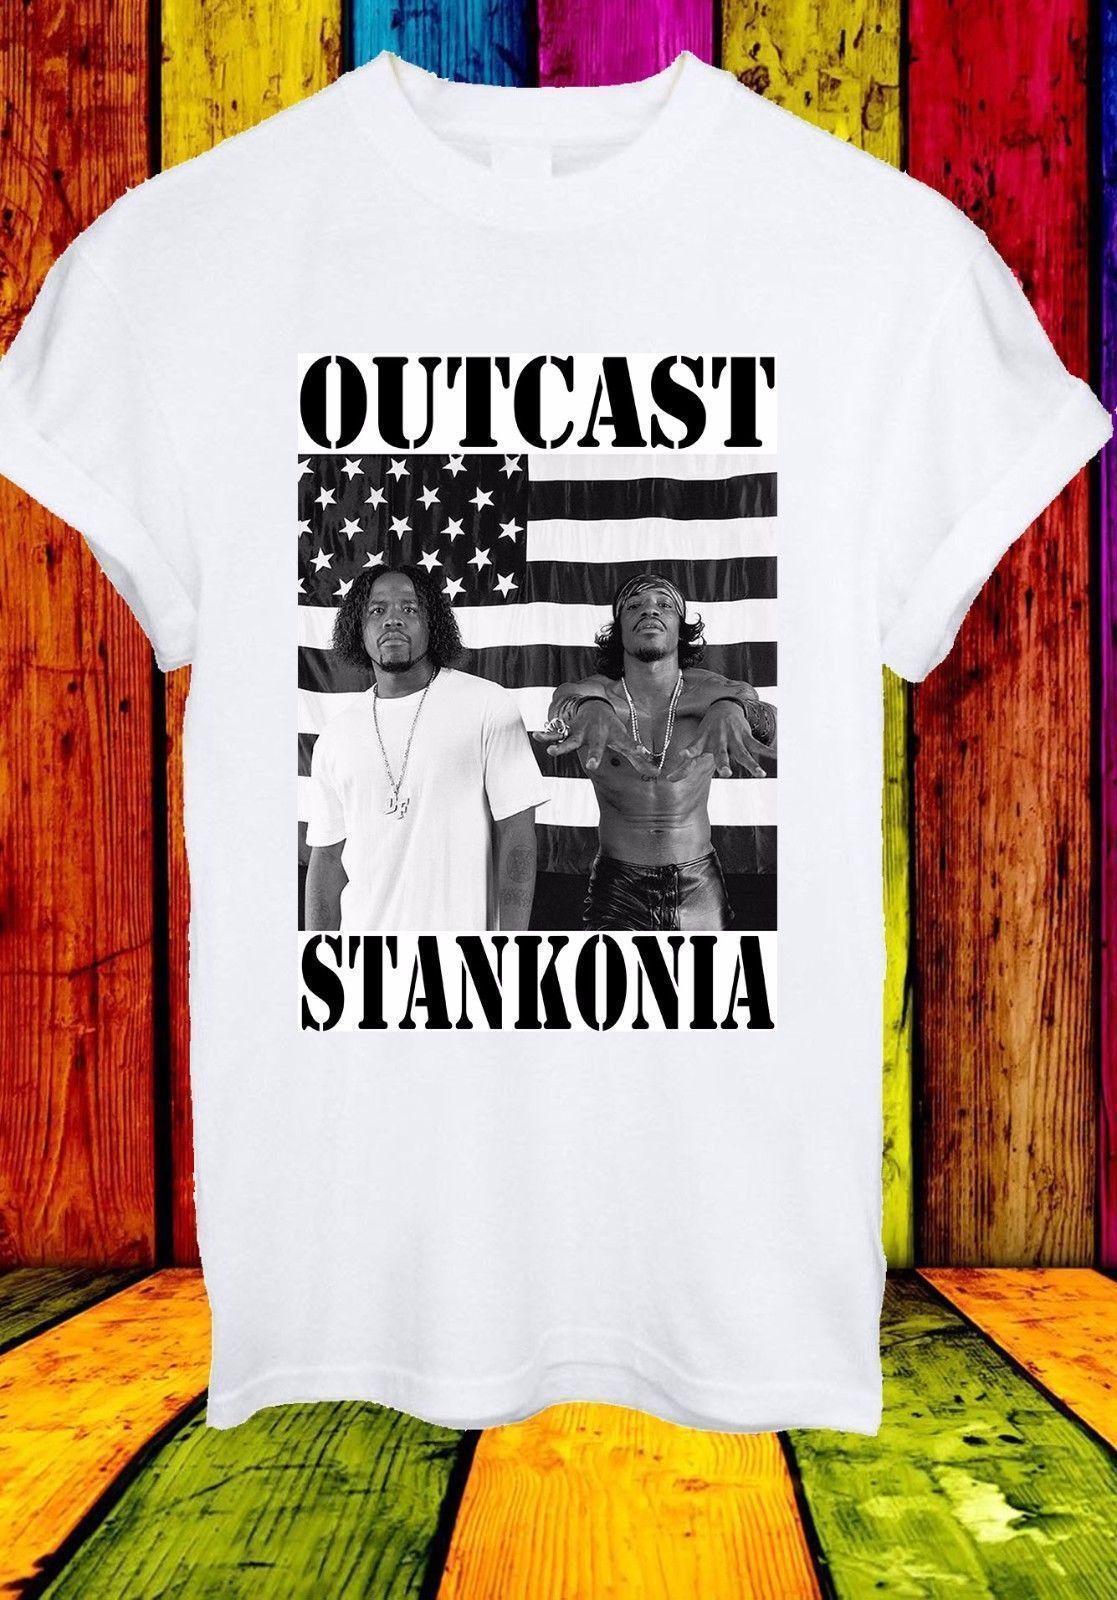 Outkast Stankonia Album Cover American Hip Hop T Shirt Womens Shirt T Shart  From Artmuz88 45c39d50c1